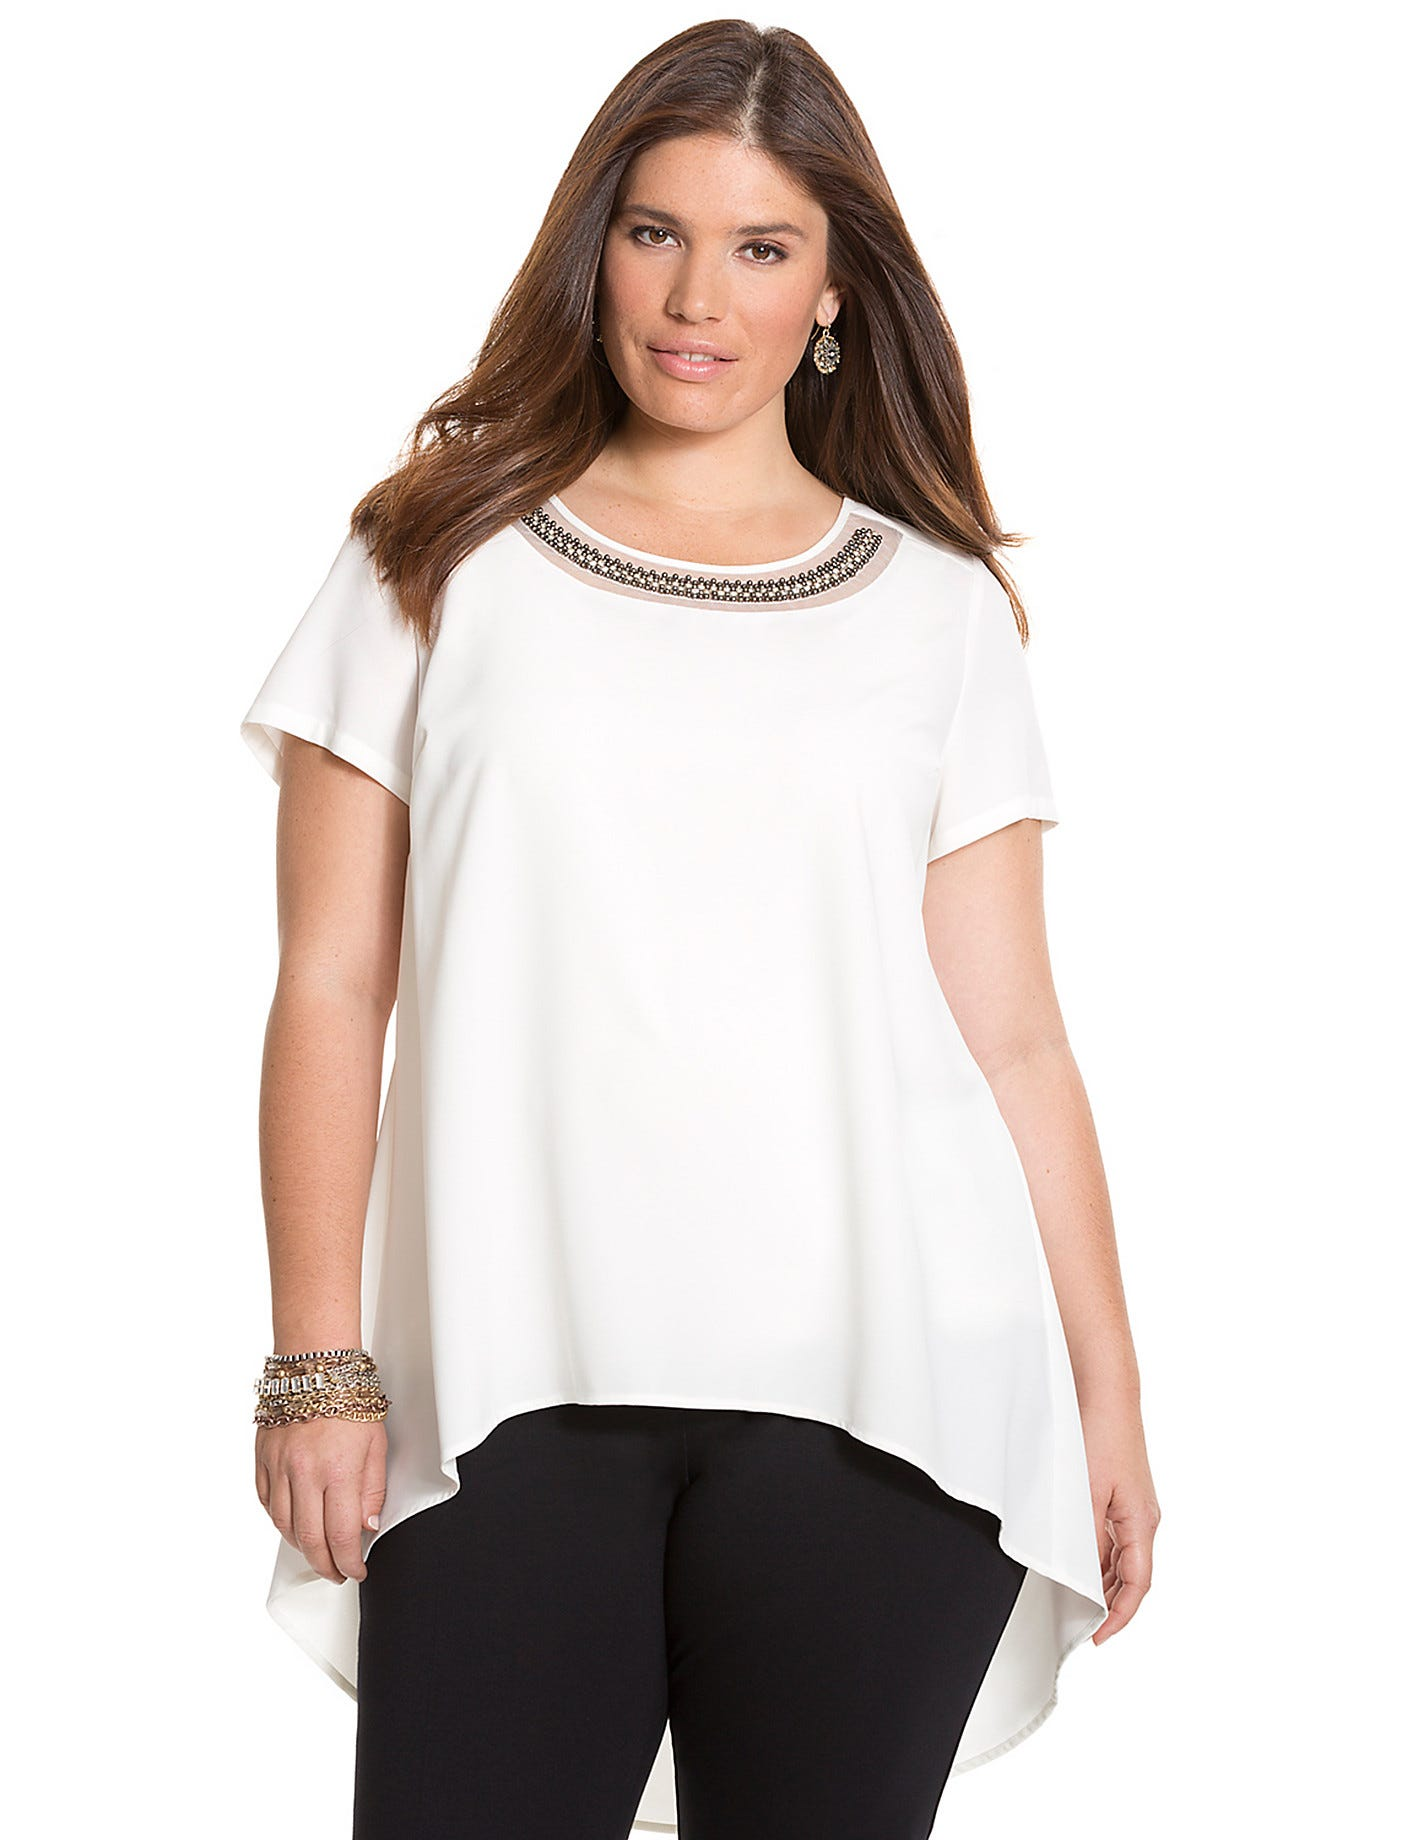 5fcabd38272 Plus Size Clothing Body Types - Full Figured Style Tips